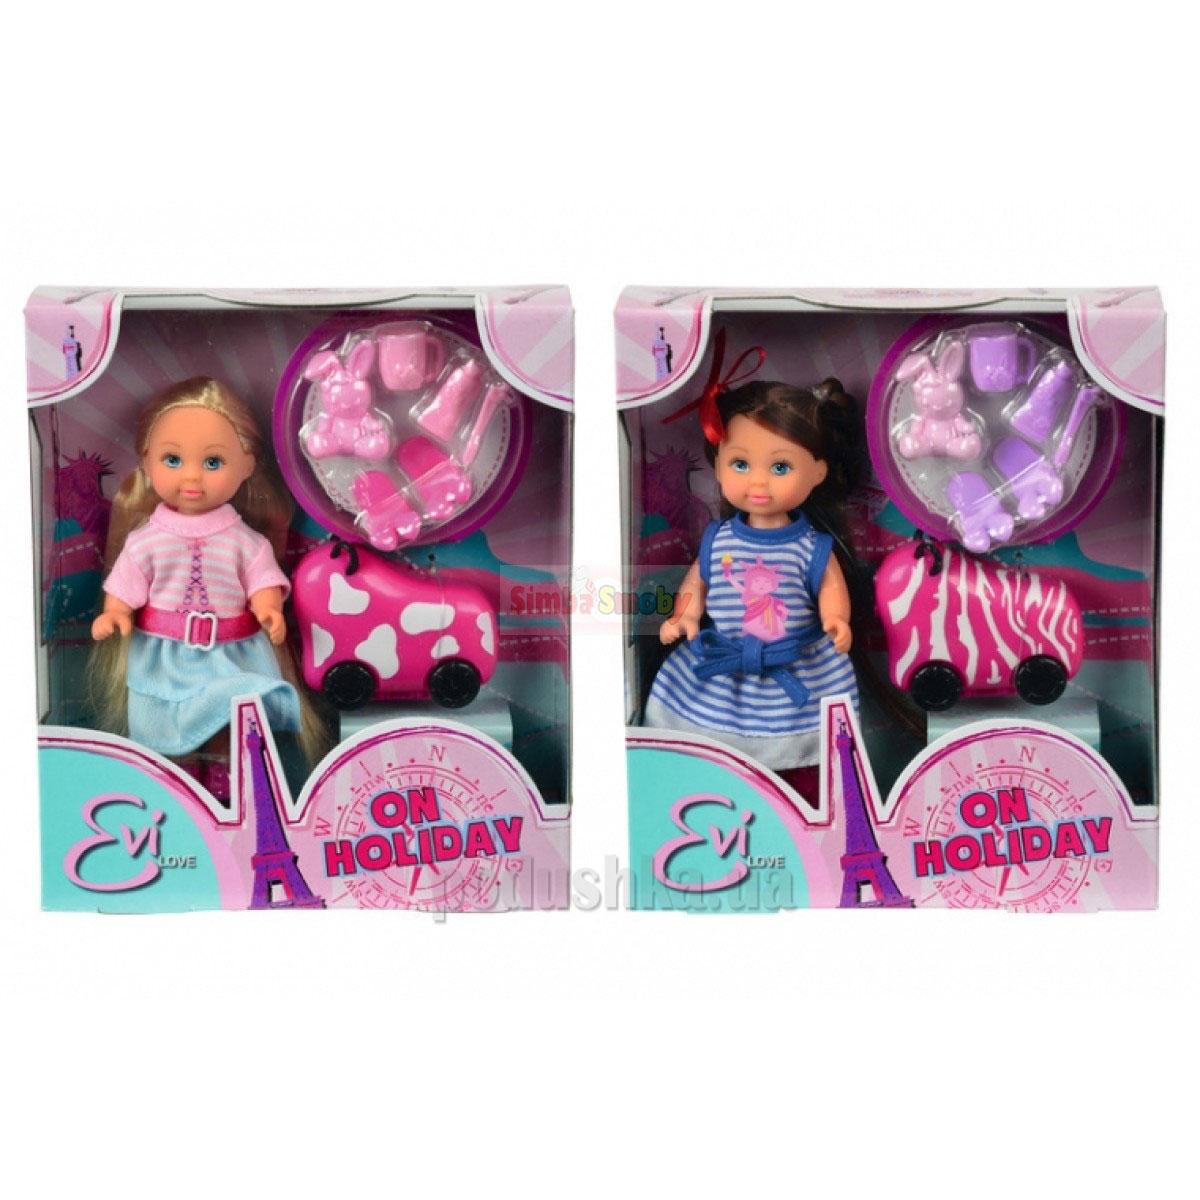 Кукла Эви Каникулы с чемоданом, 6 аксессуаров, 2 вида Steffi Evi Love 5730942